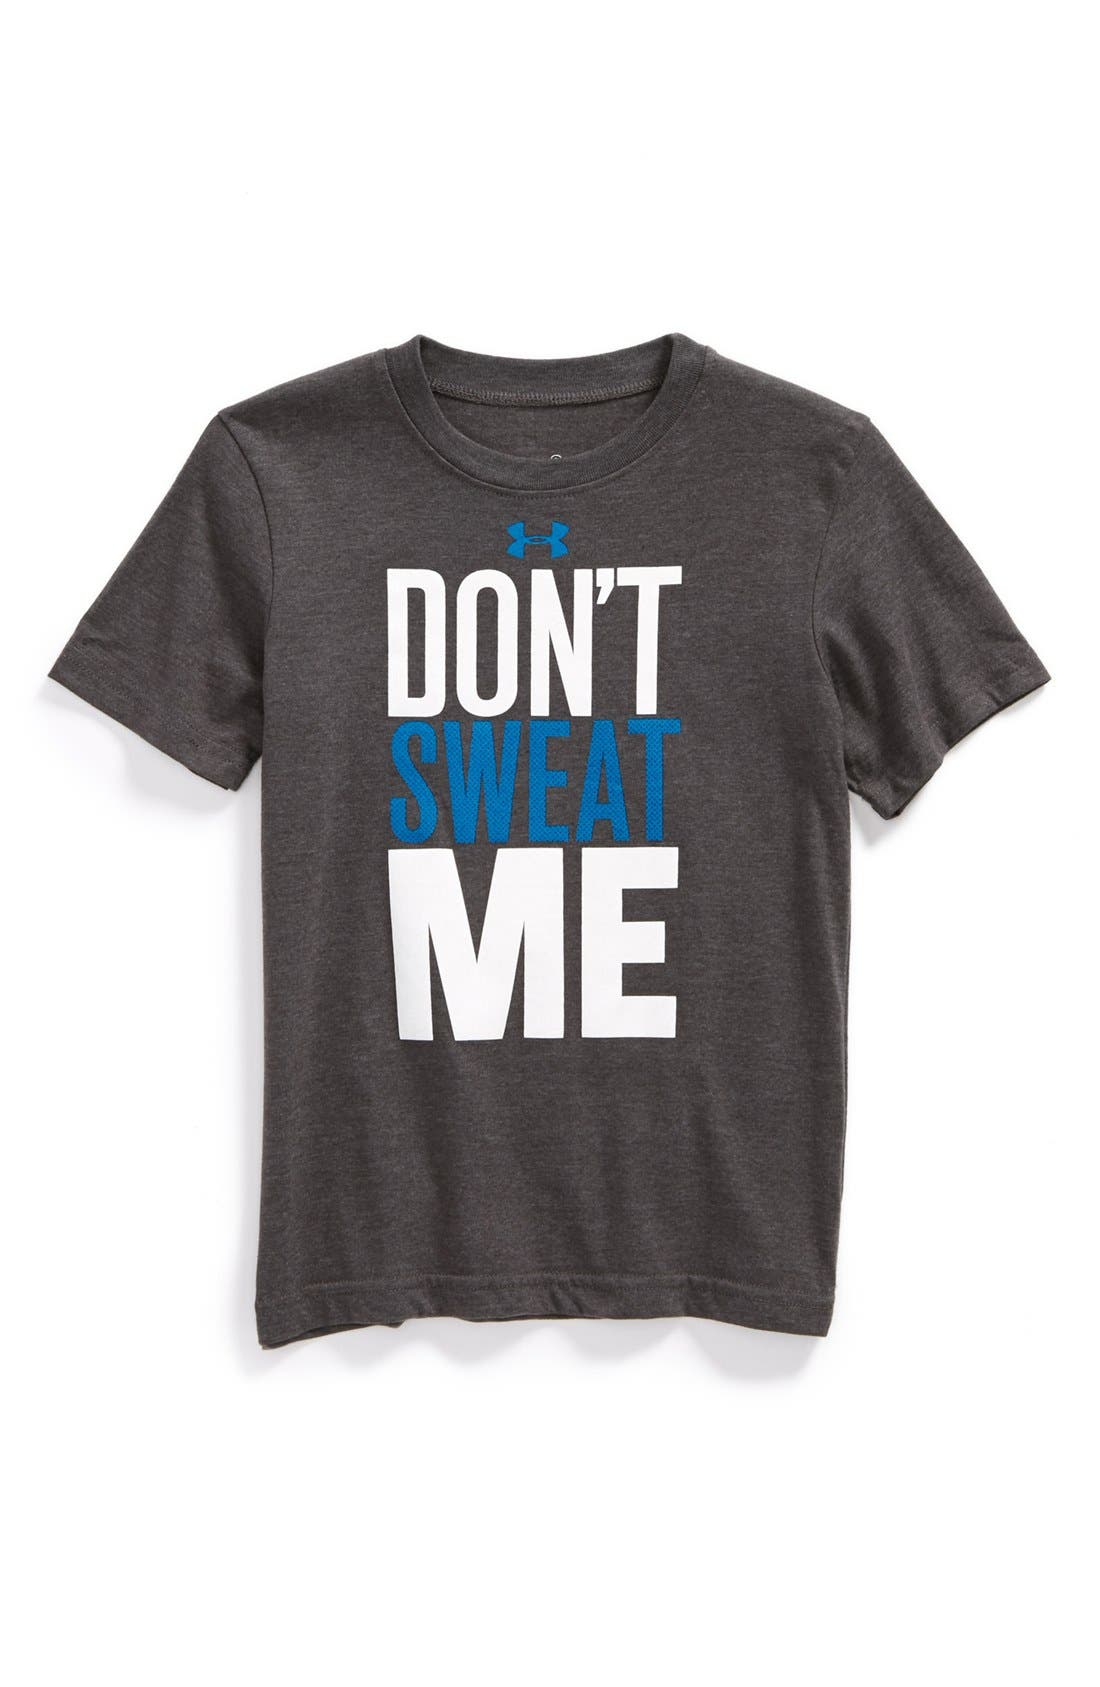 Main Image - Under Armour 'Don't Sweat Me' T-Shirt (Little Boys)